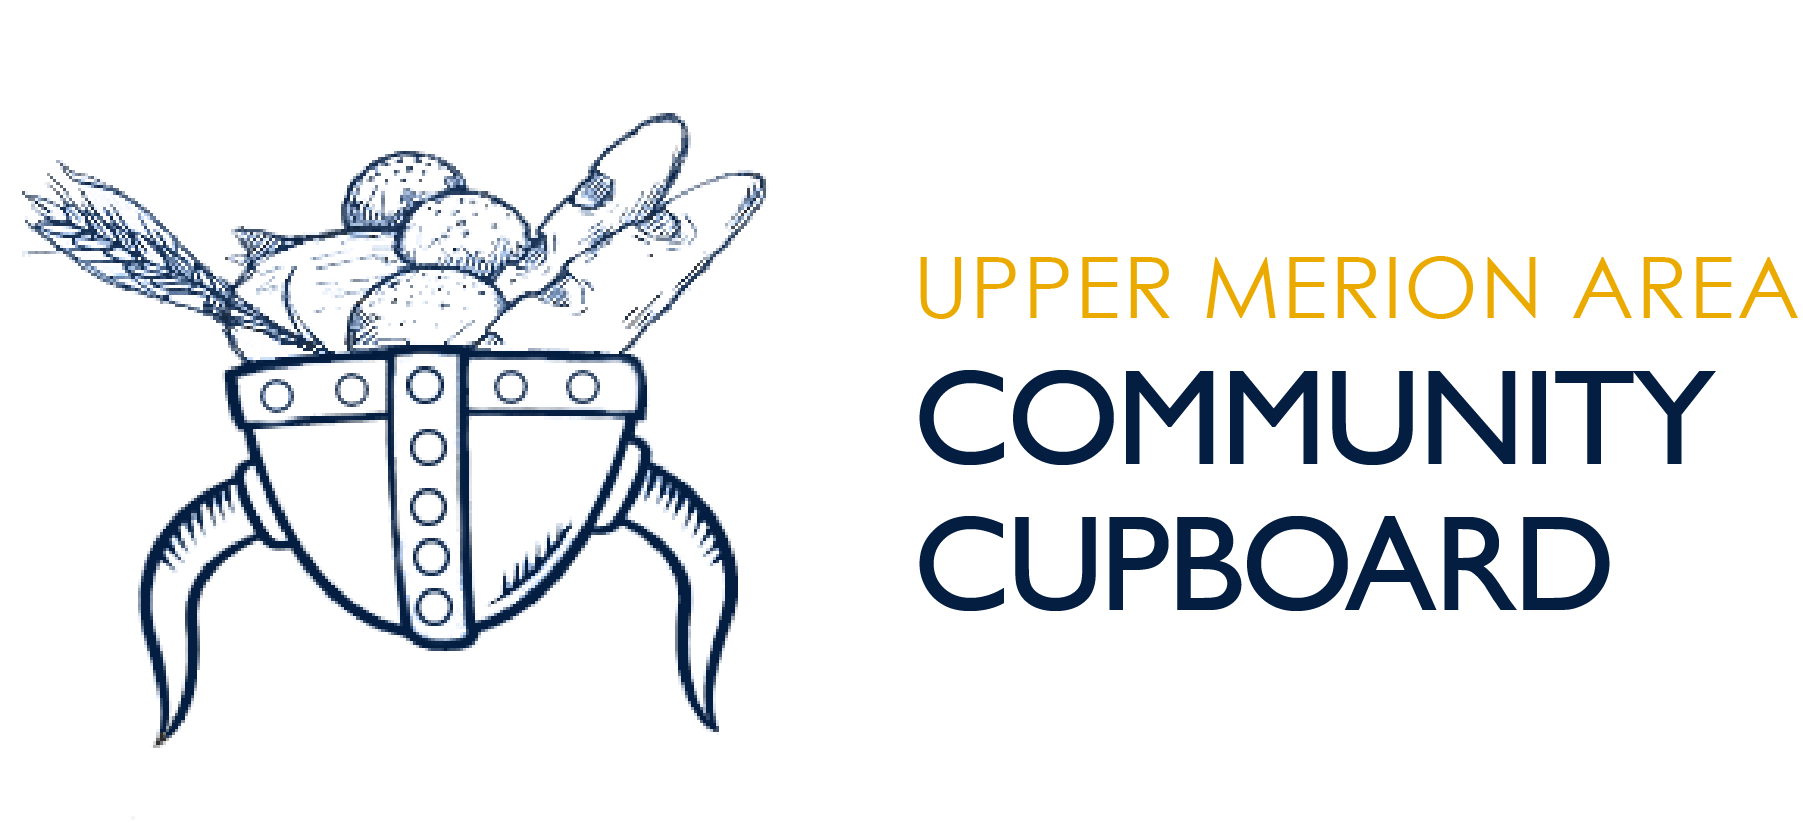 Upper Merion Area Community Cupboard